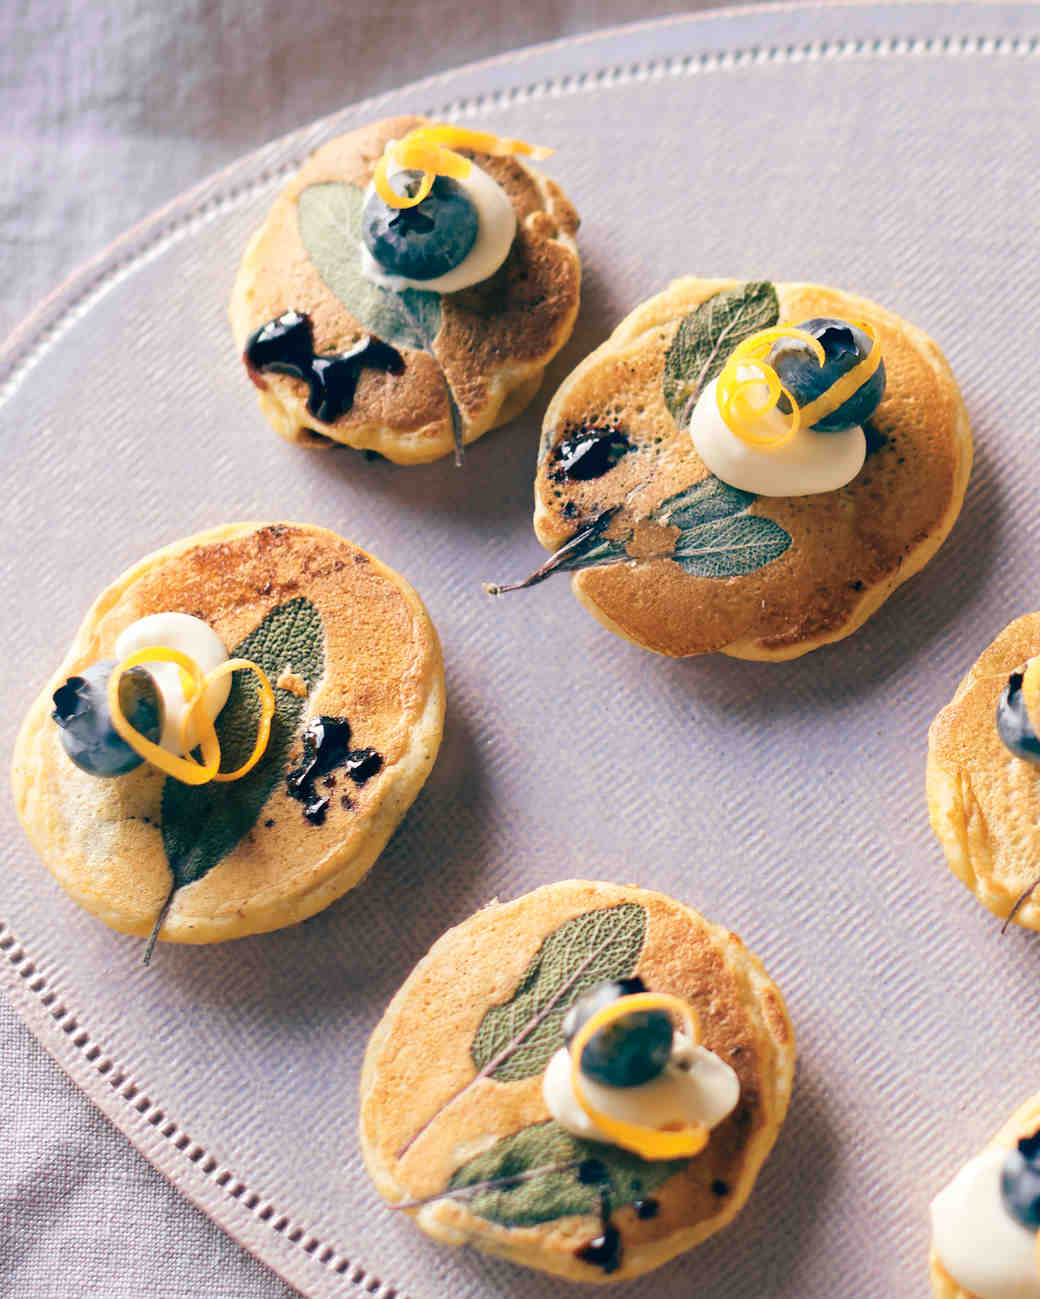 appetizer-corncakes-sage-blueberry-savory-bites-silos-320-mwd110998.jpg